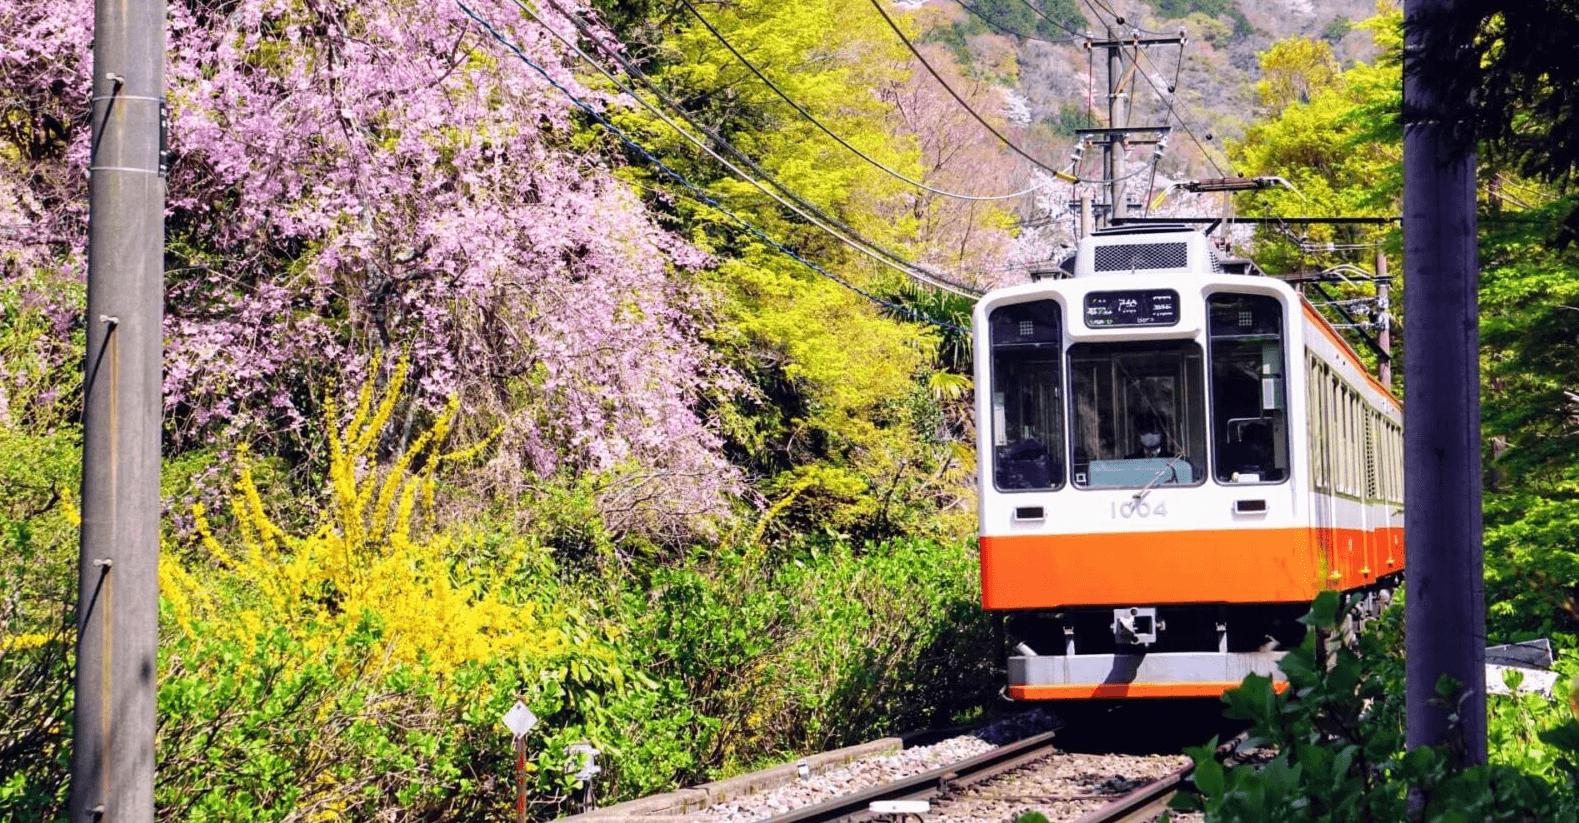 hakone-tozan-railway-banner-edit